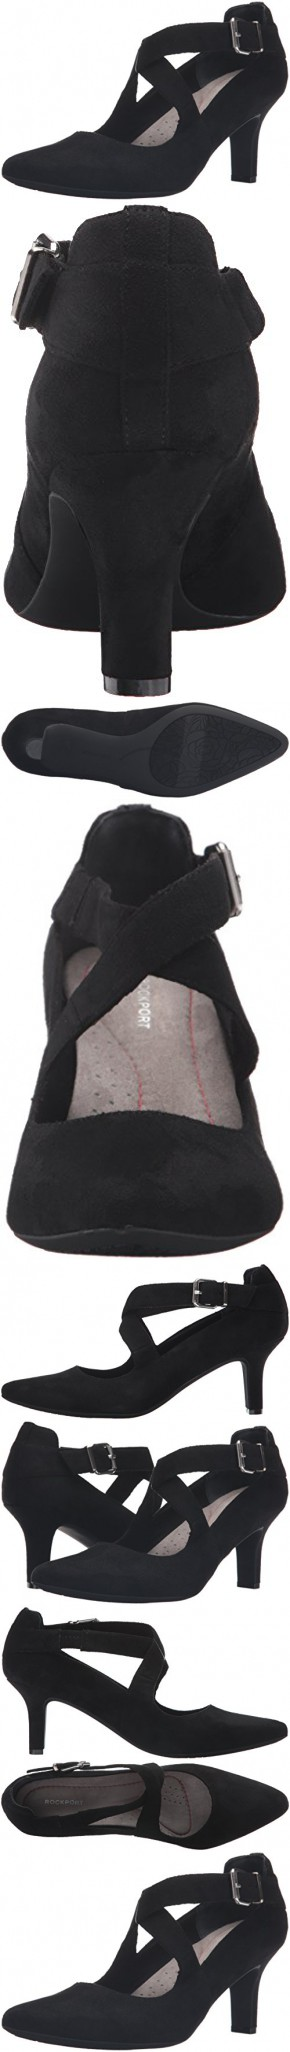 Rockport Women's Sharna Cross Strap Dress Pump, Black Soft Microsuede, 11 M (B)